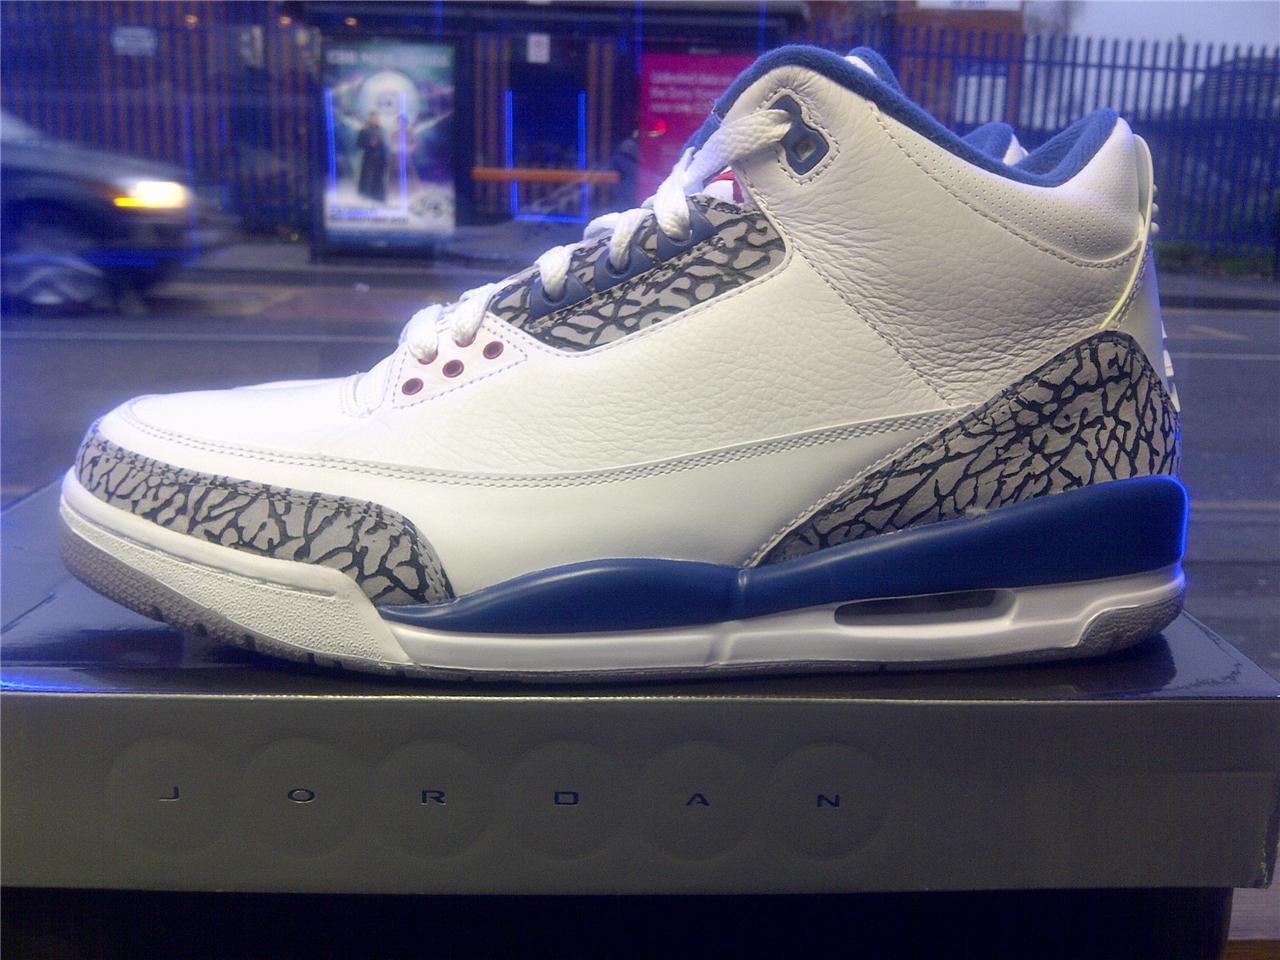 00a0072ce2a Air Jordan 3 True Blue Ebay Air Jordan 5 Retro Blue